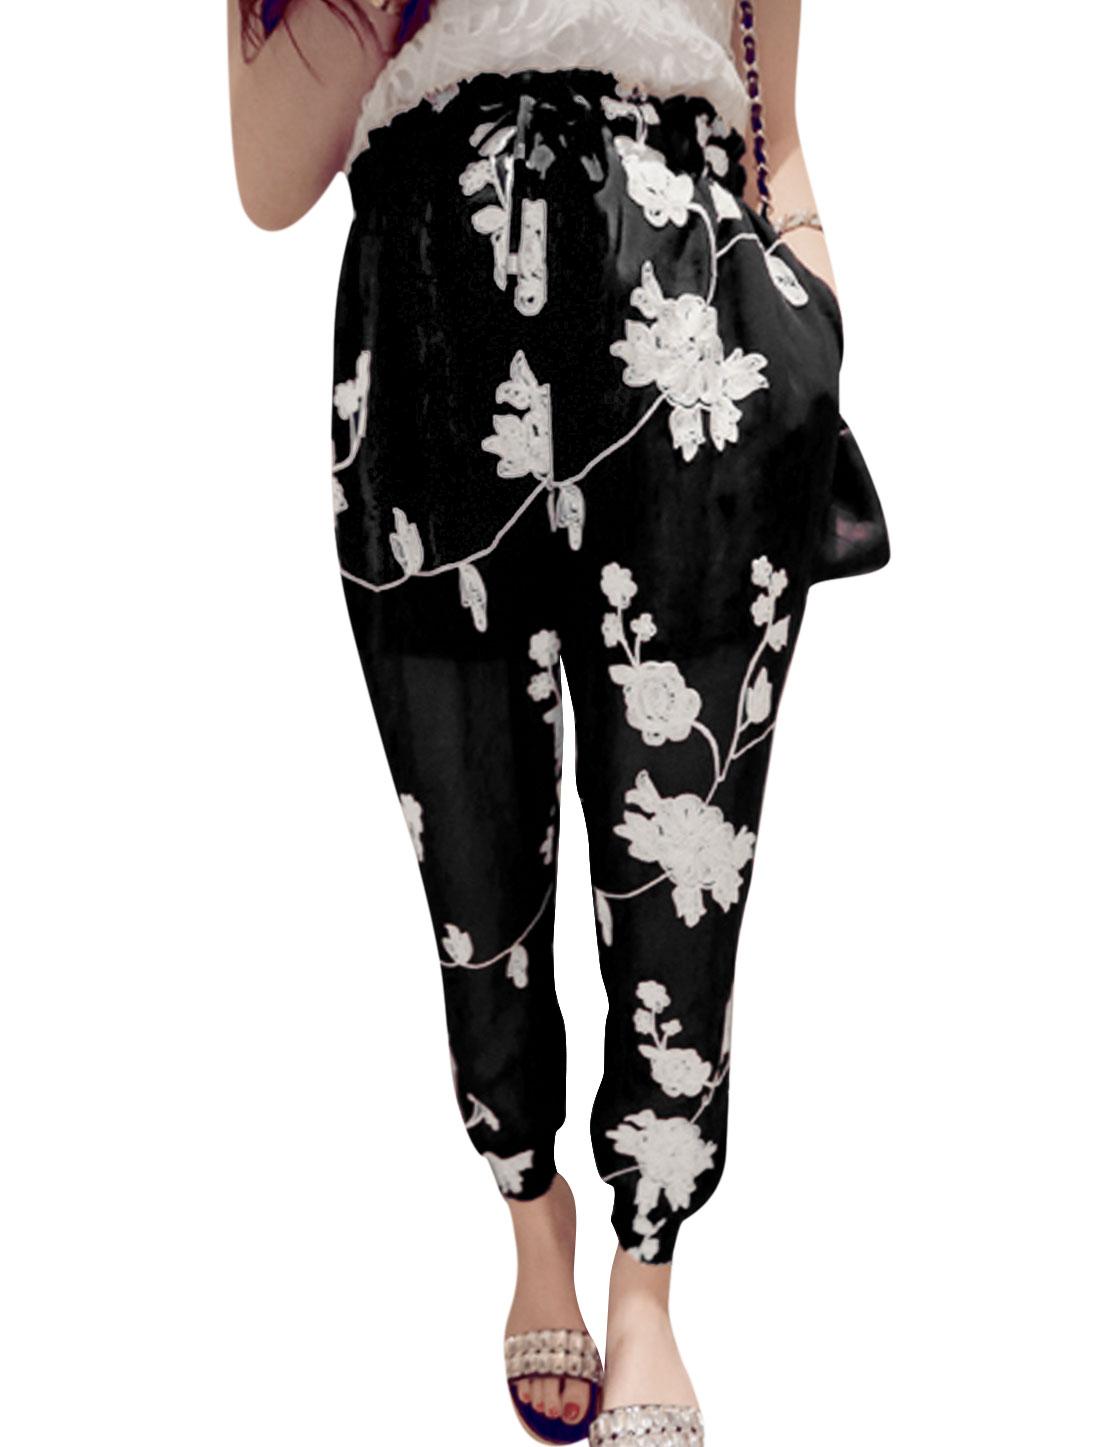 Lady Stretchy Drawstring Waist Floral Pattern Casual Chiffon Pants Black XS